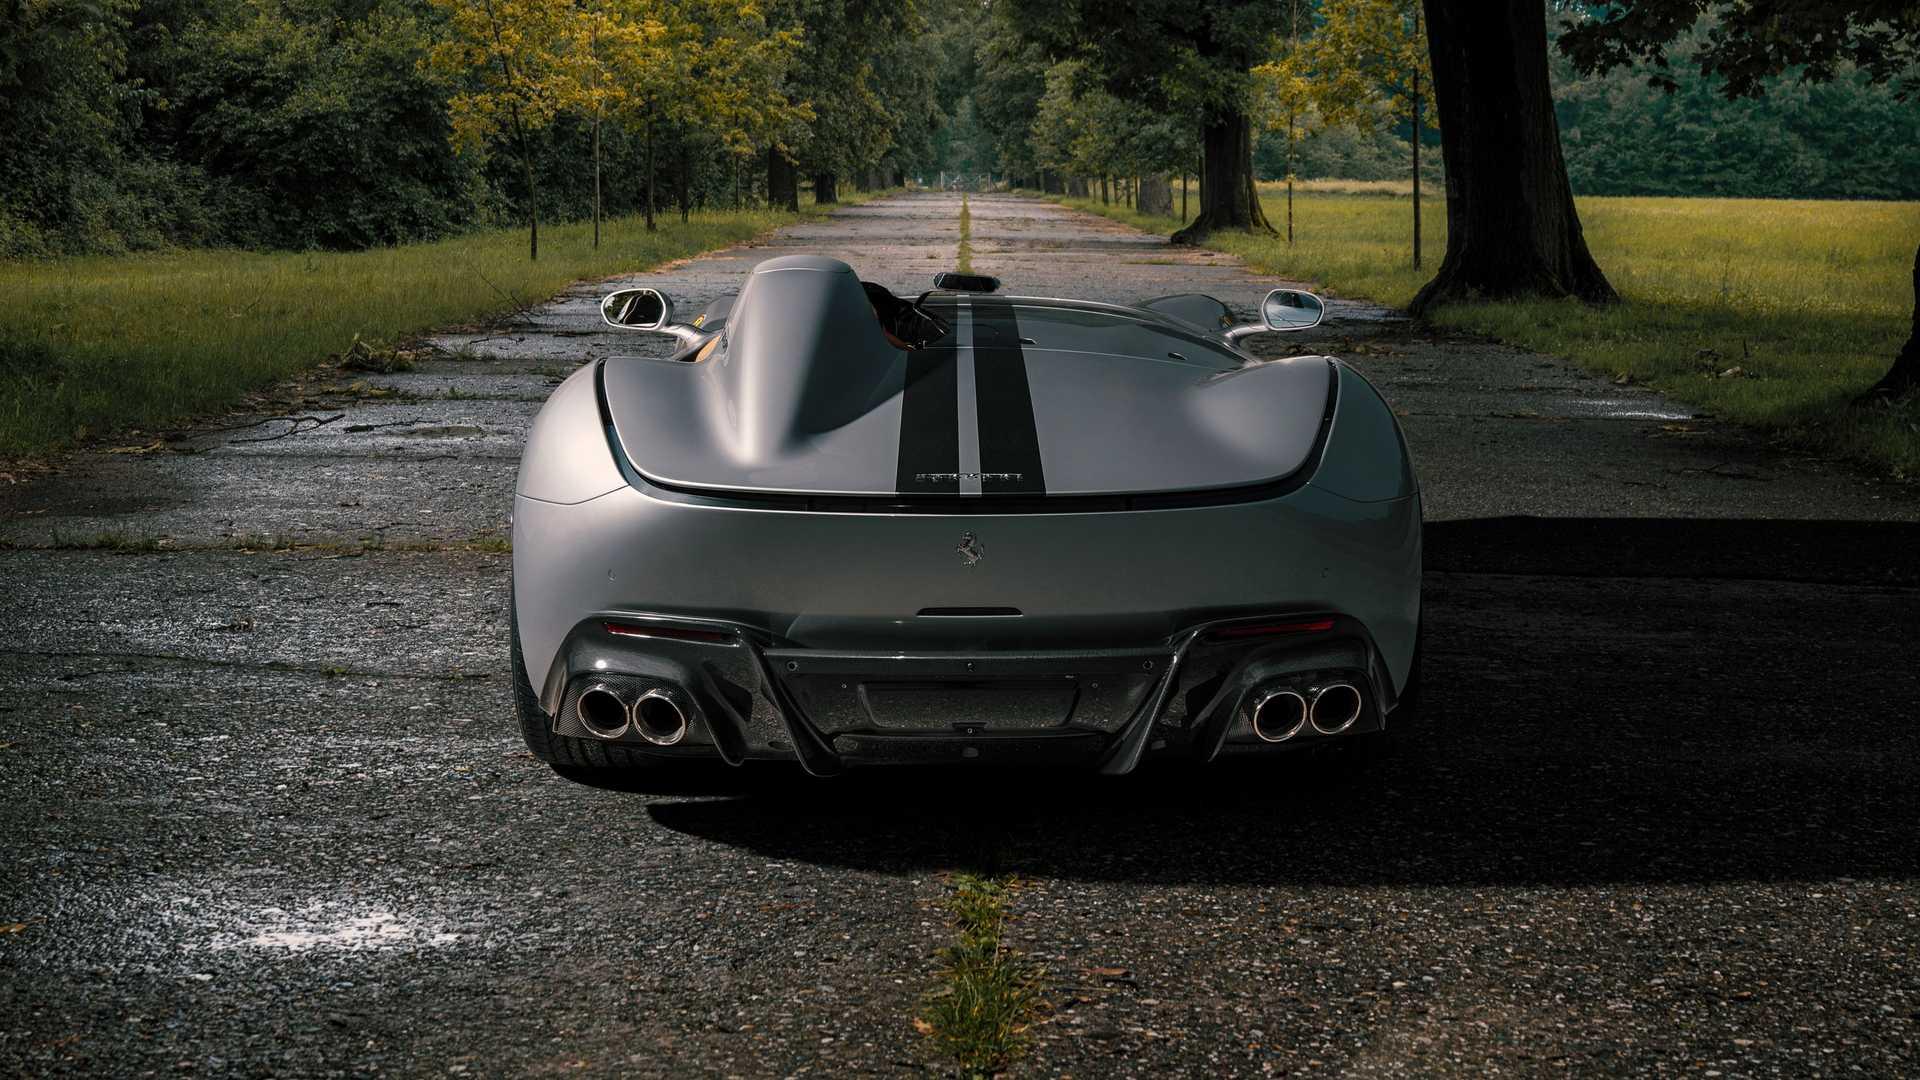 Ferrari_Monza_SP1_tuning_by_Novitec_0004